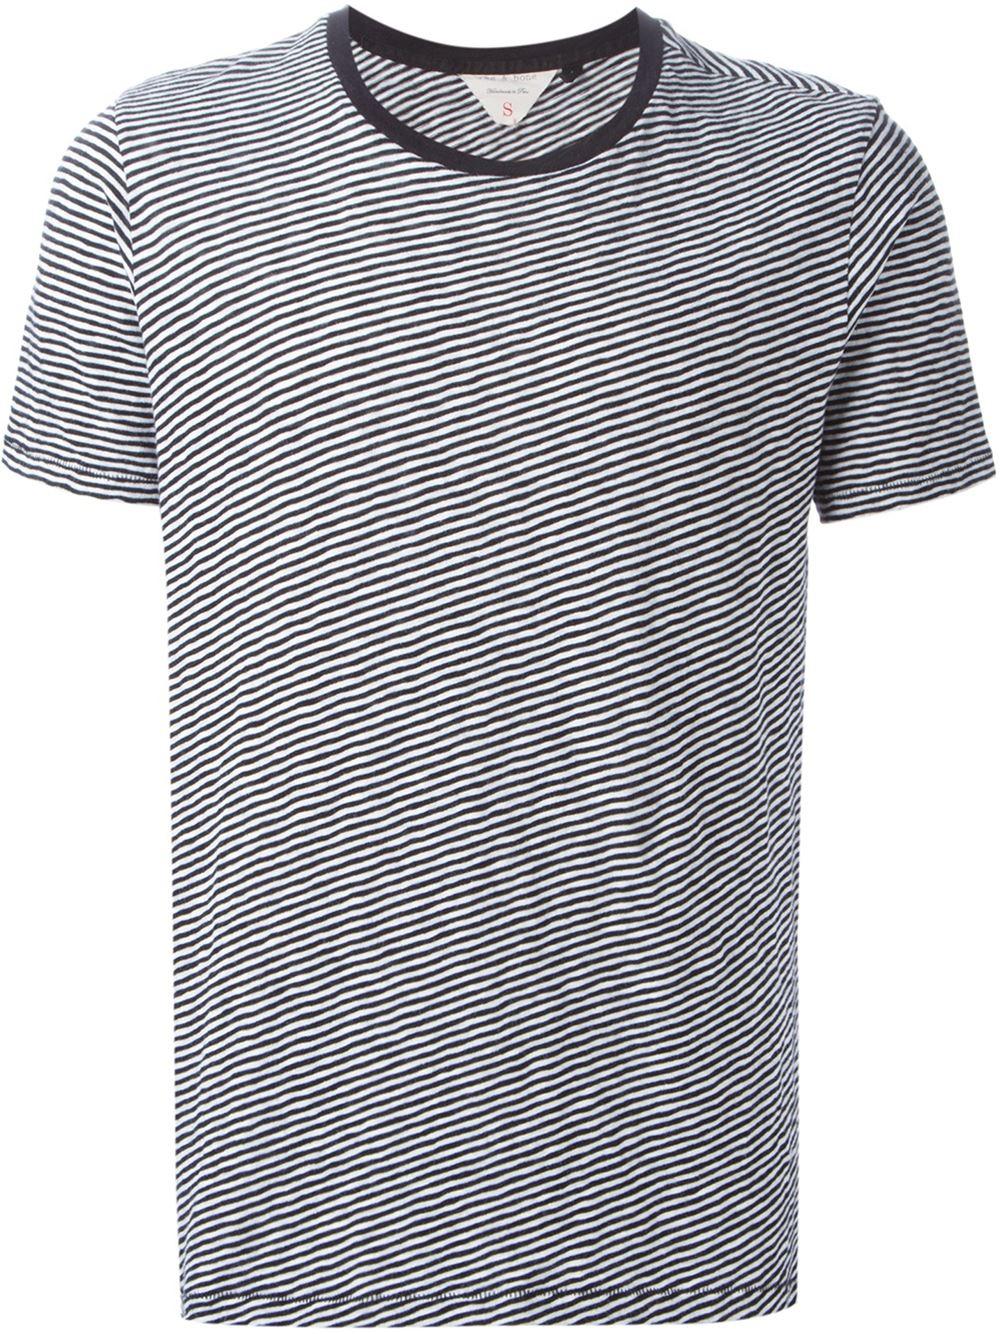 Lyst Rag Bone Striped T Shirt In Black For Men